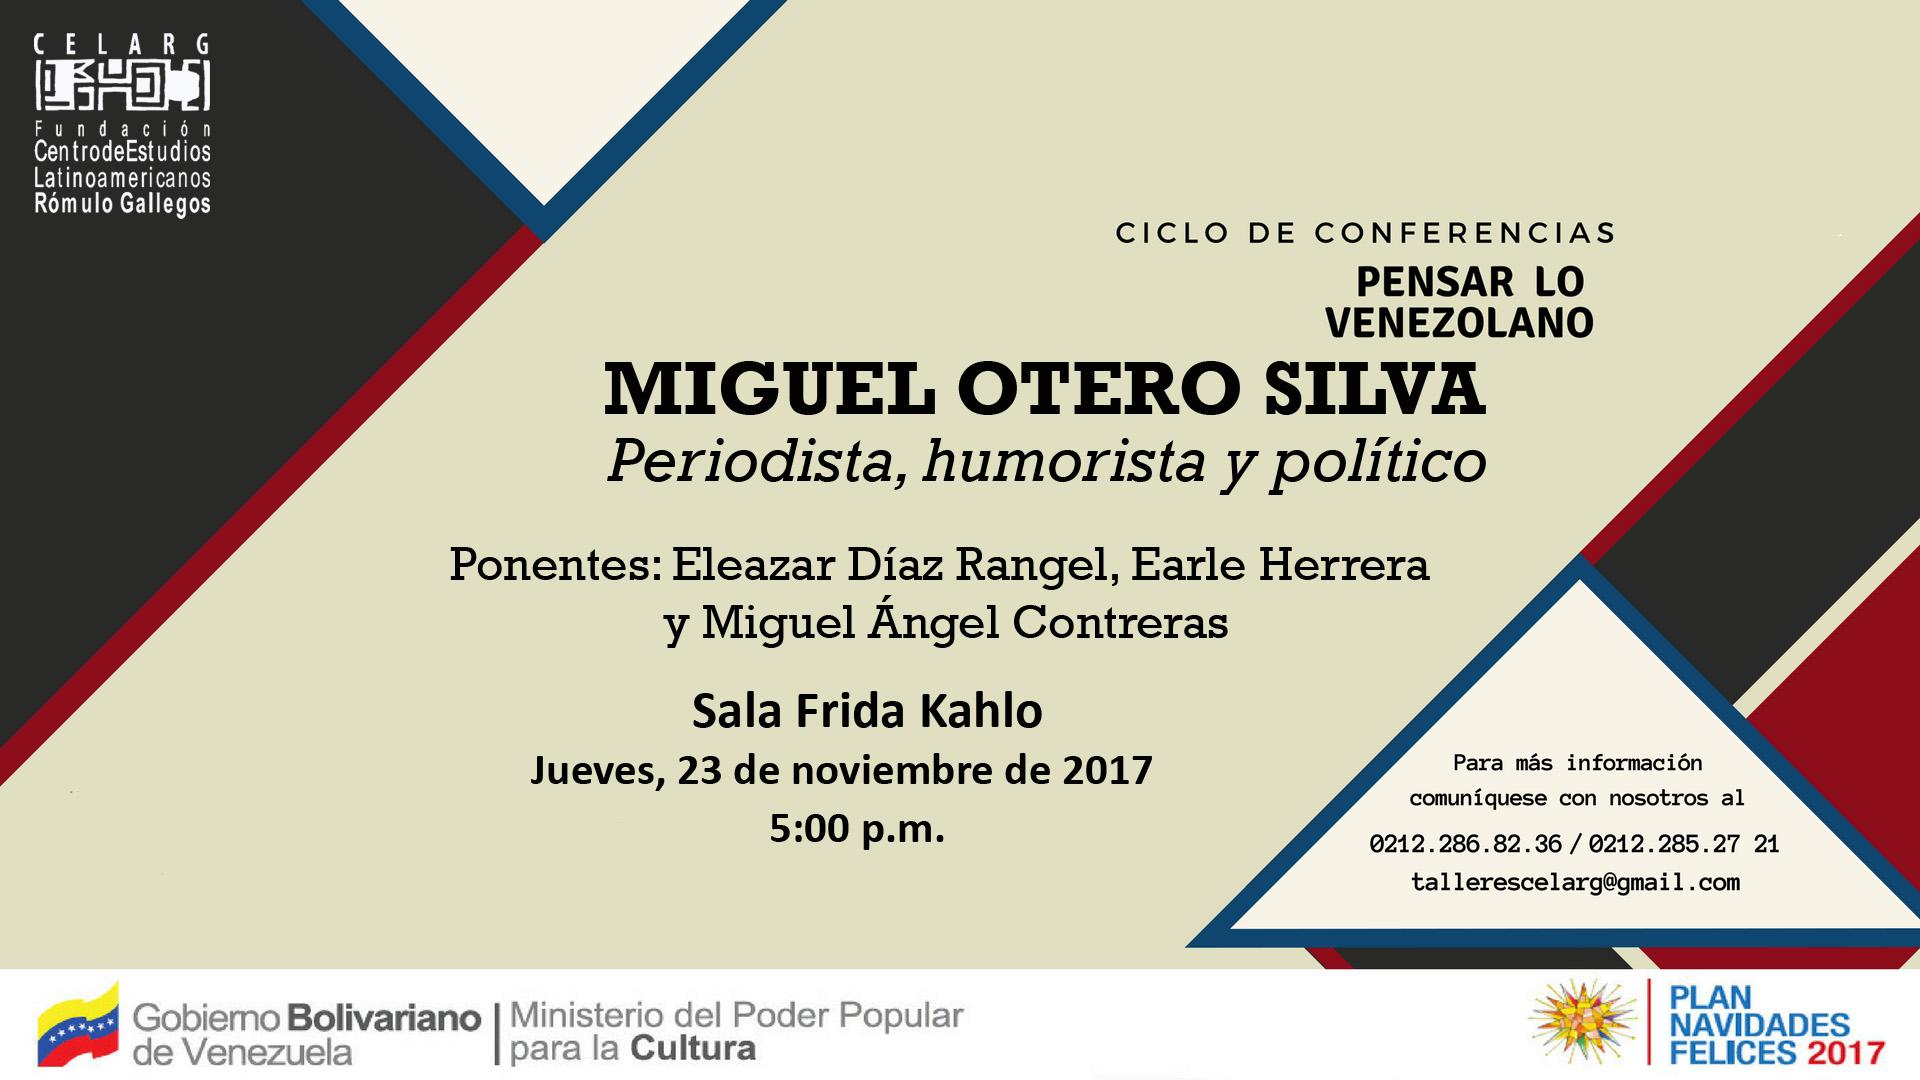 PENSAR LO VENEZOLANO Miguel Otero Silva